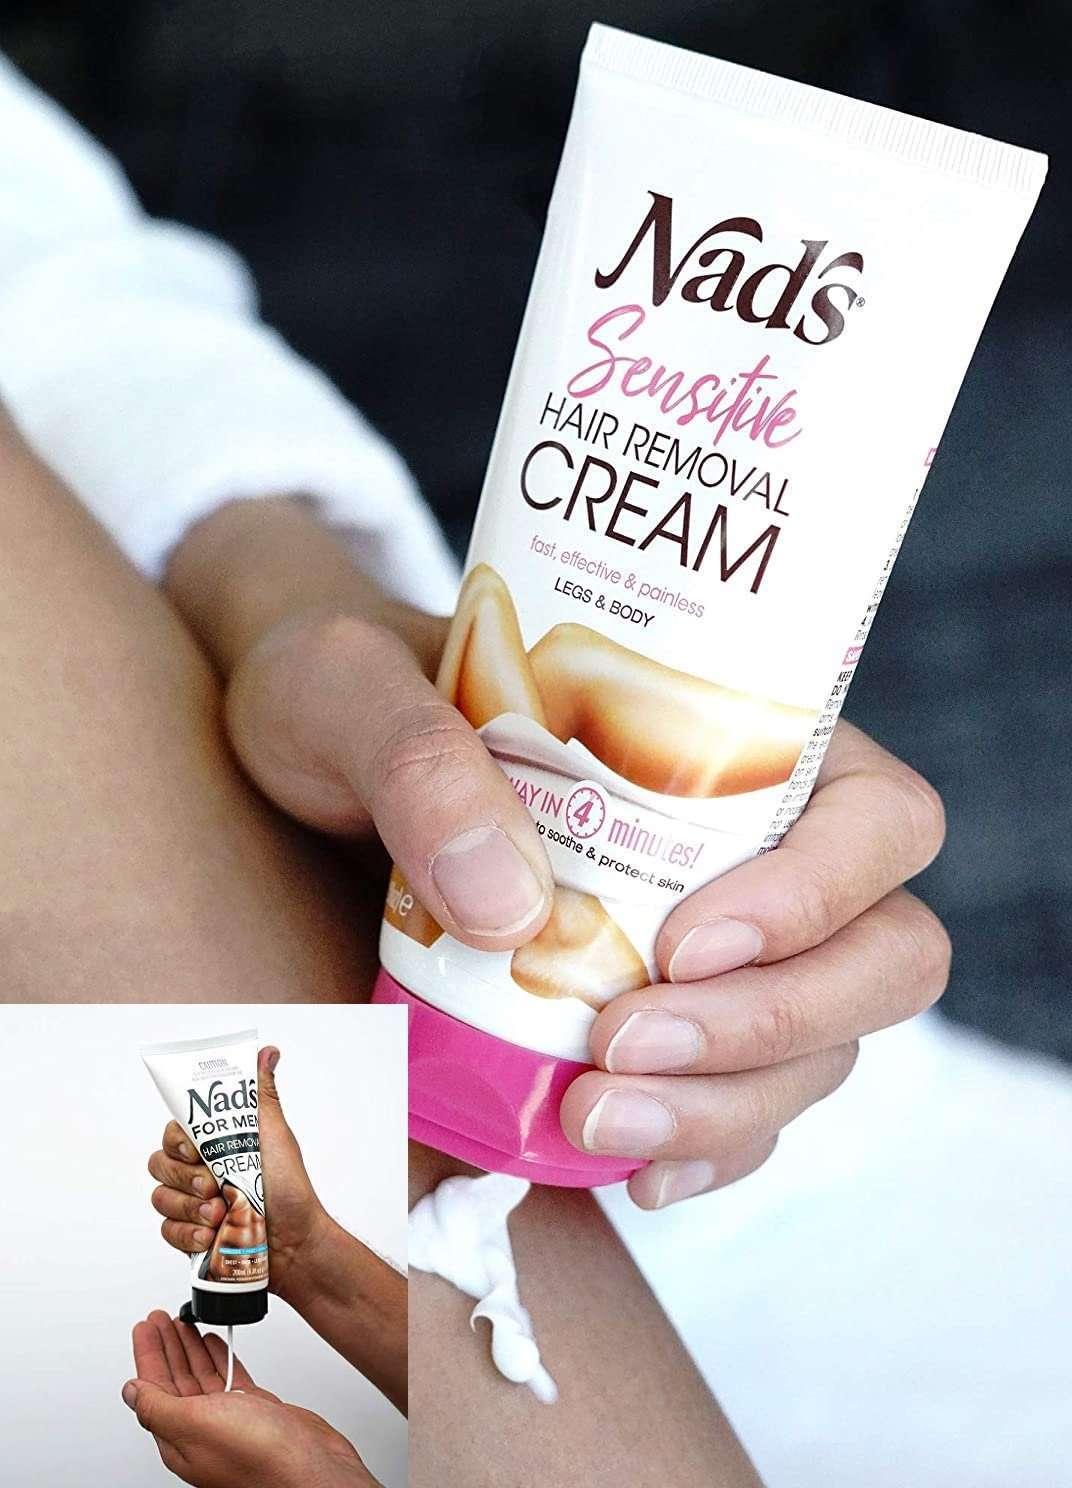 Buy Nad's Hair Removal Cream - - Sensitive Depilatory Cream For men and women